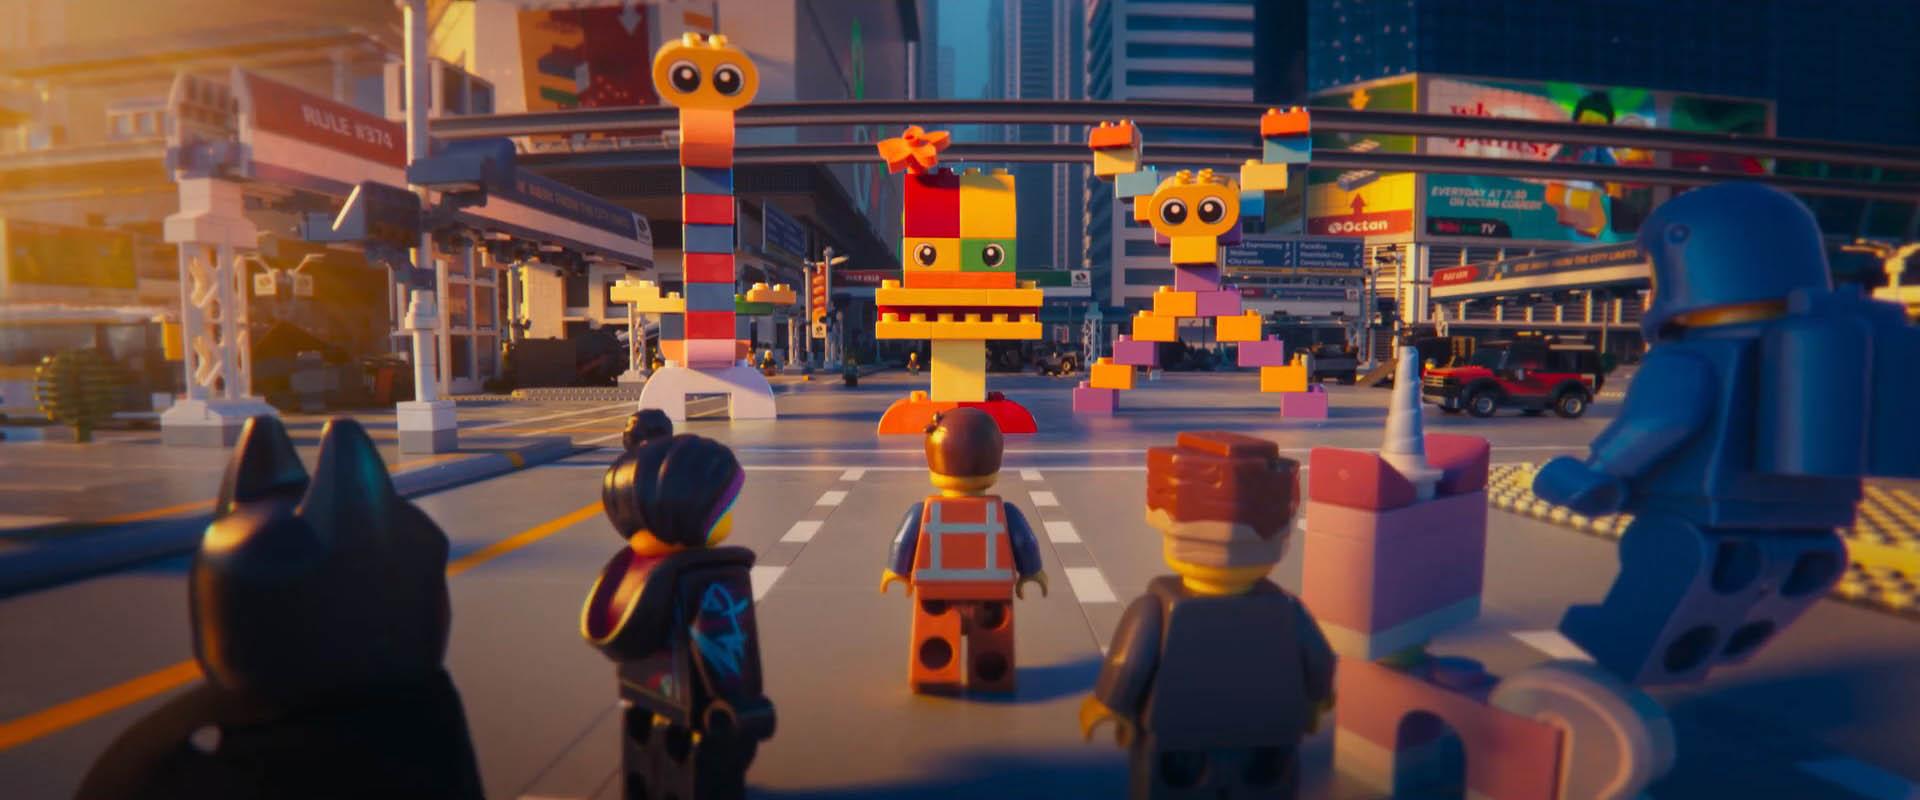 Image result for lego movie 2 trailer 3